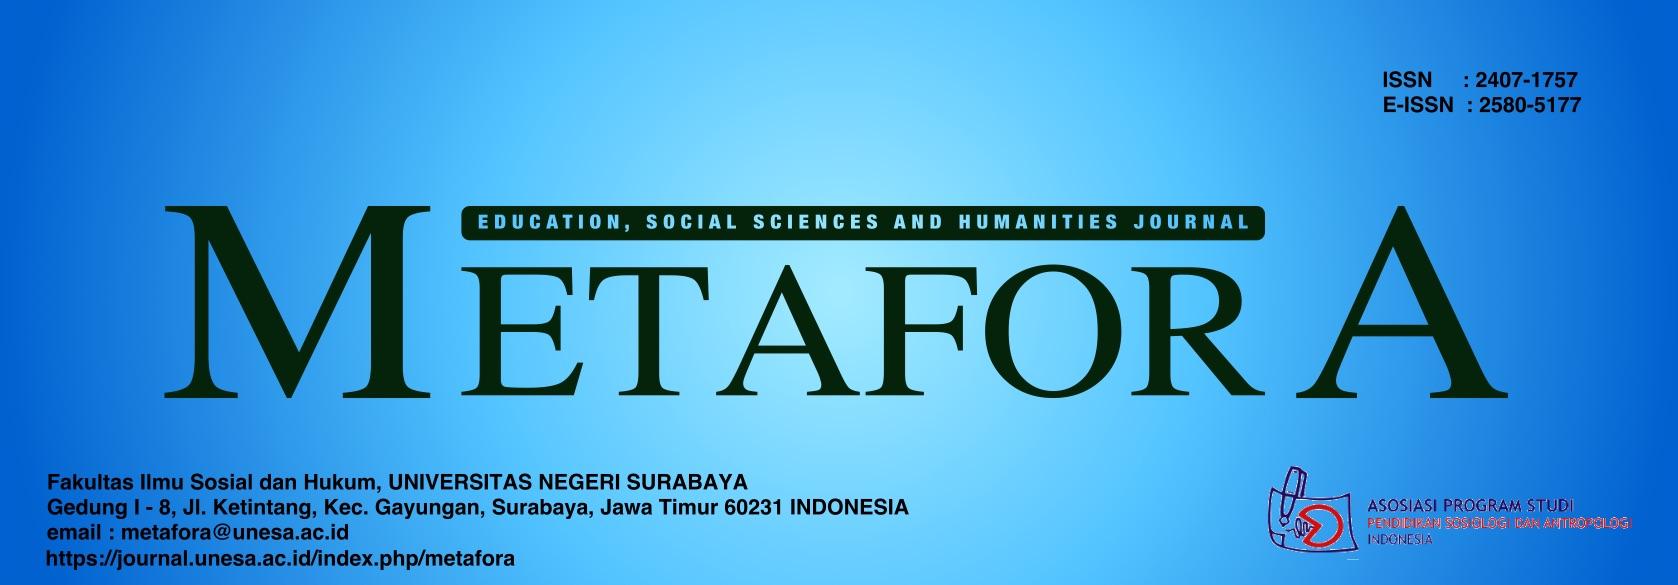 Metafora: Education, Social Sciences and Humanities Journal